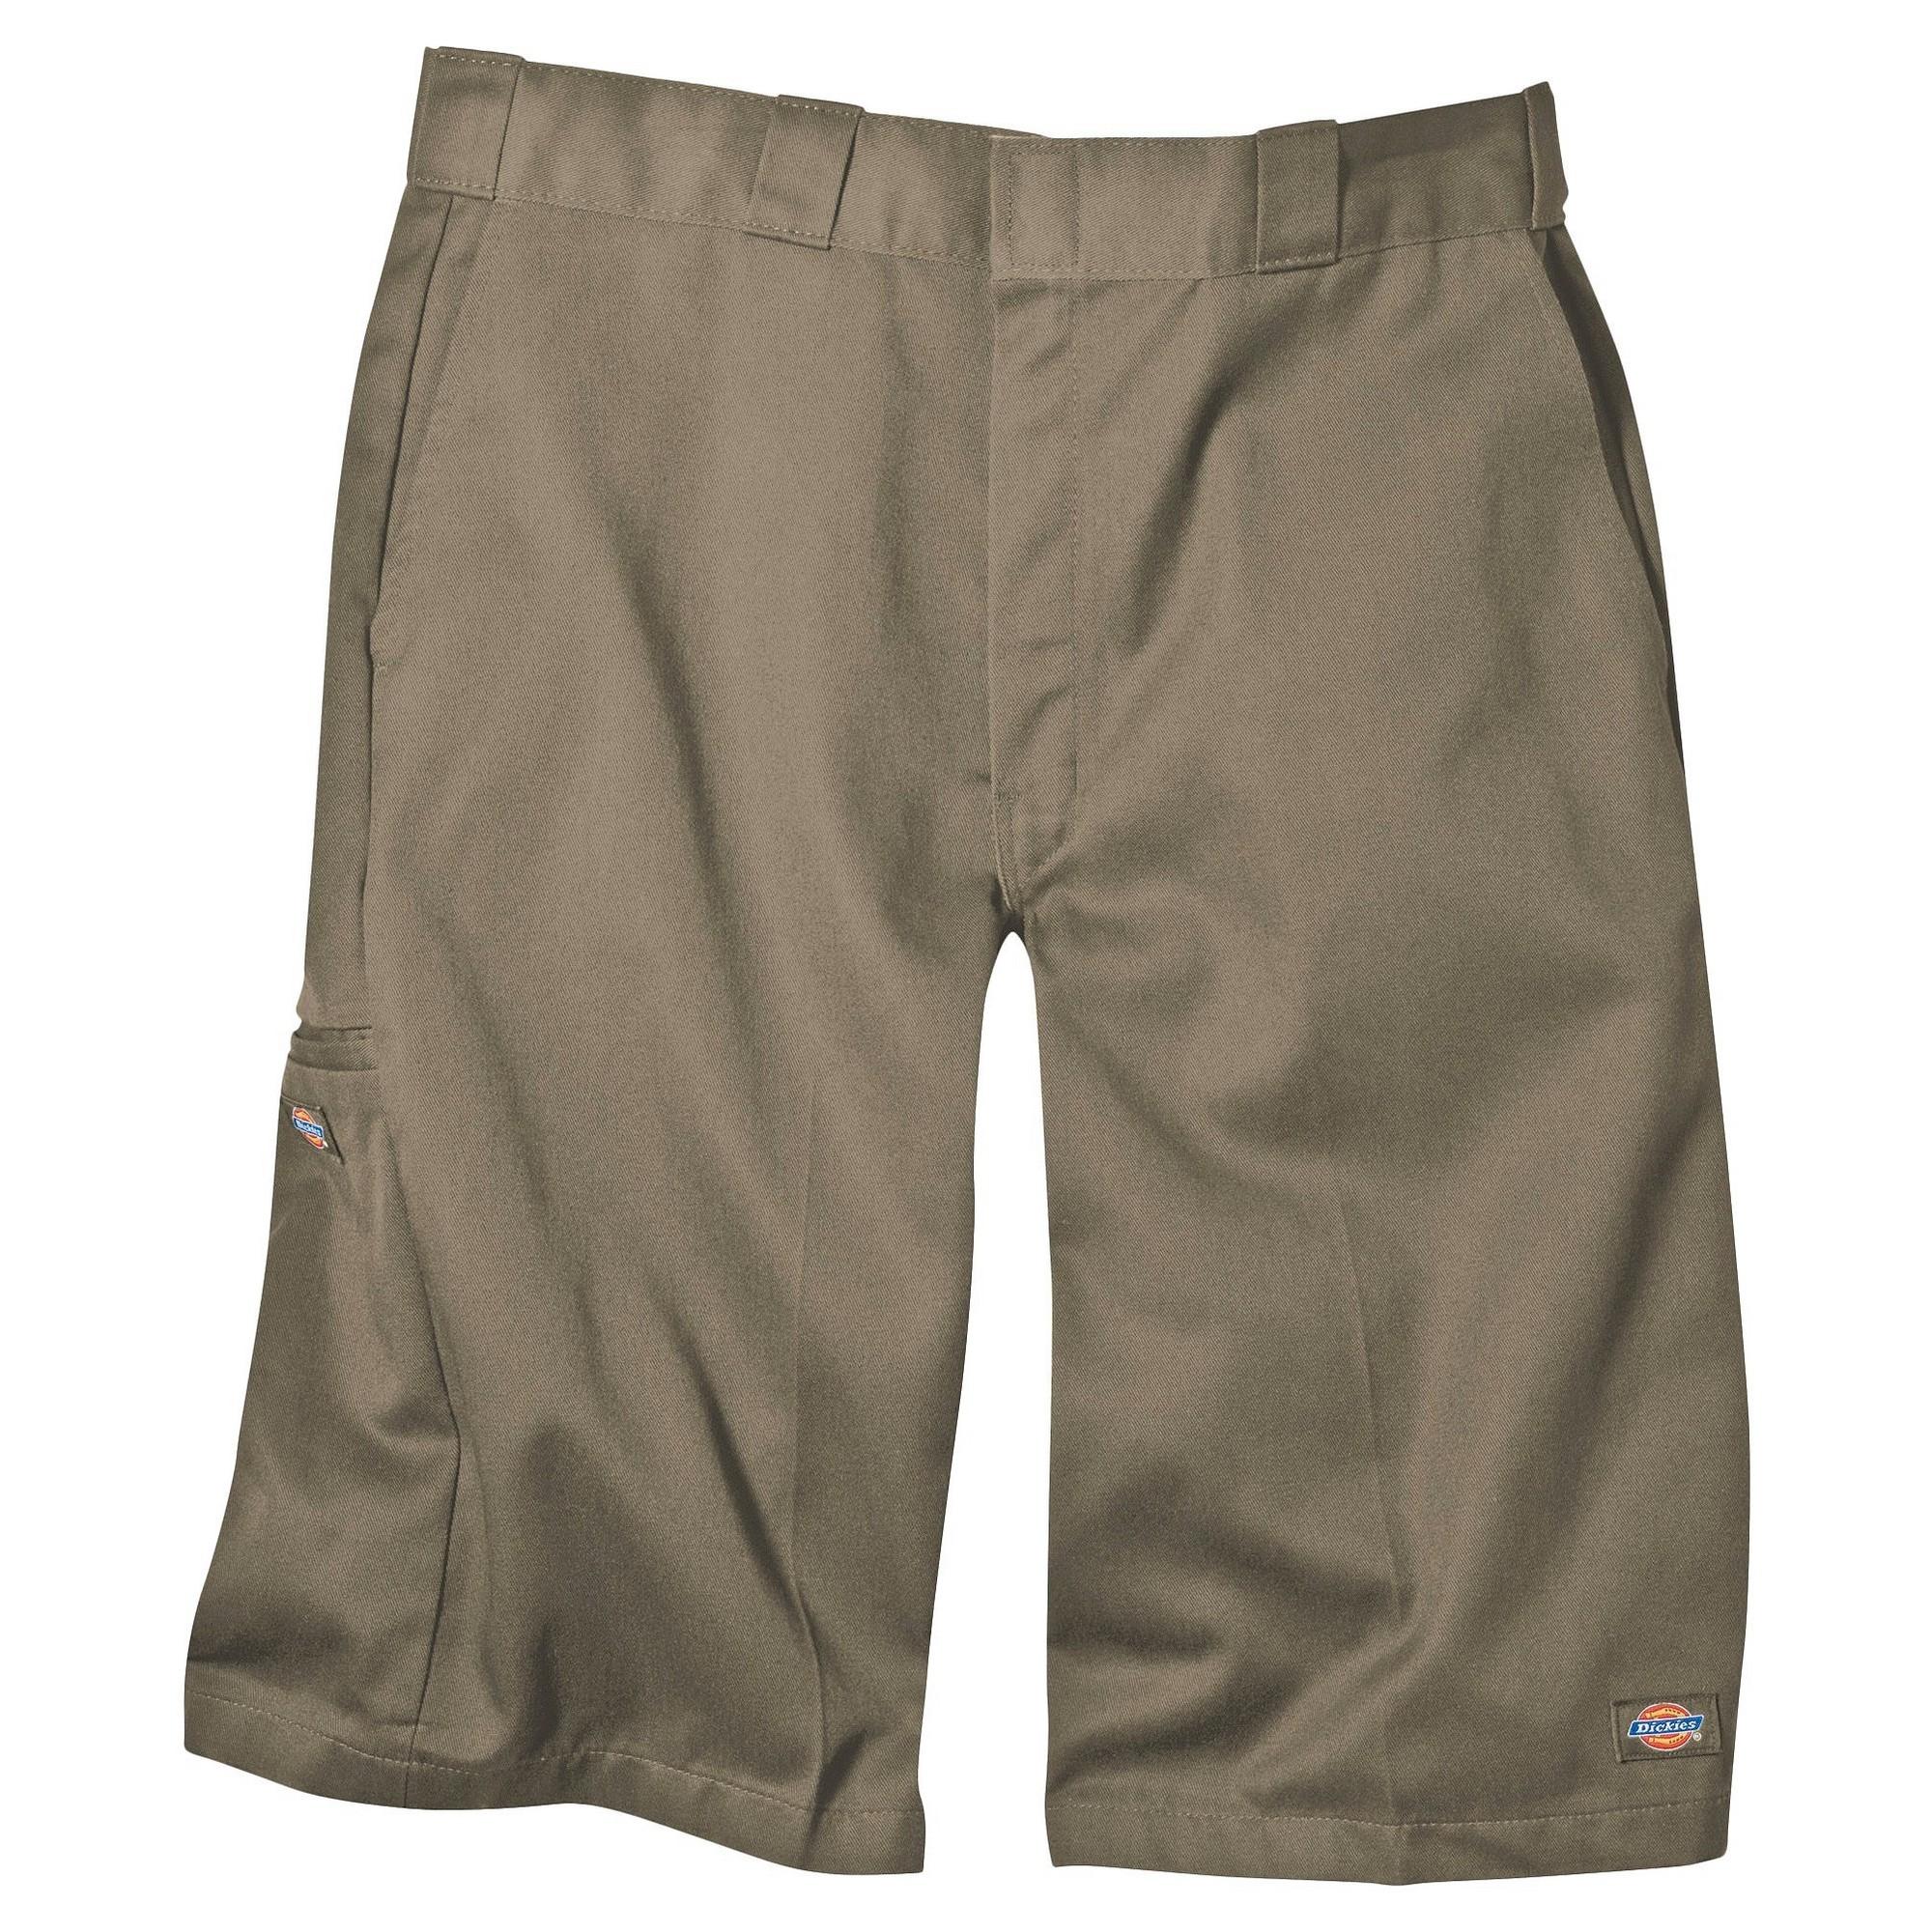 'Dickies Men's Loose Fit Twill 13'' Multi-Pocket Work Shorts- Khaki 32, Green'